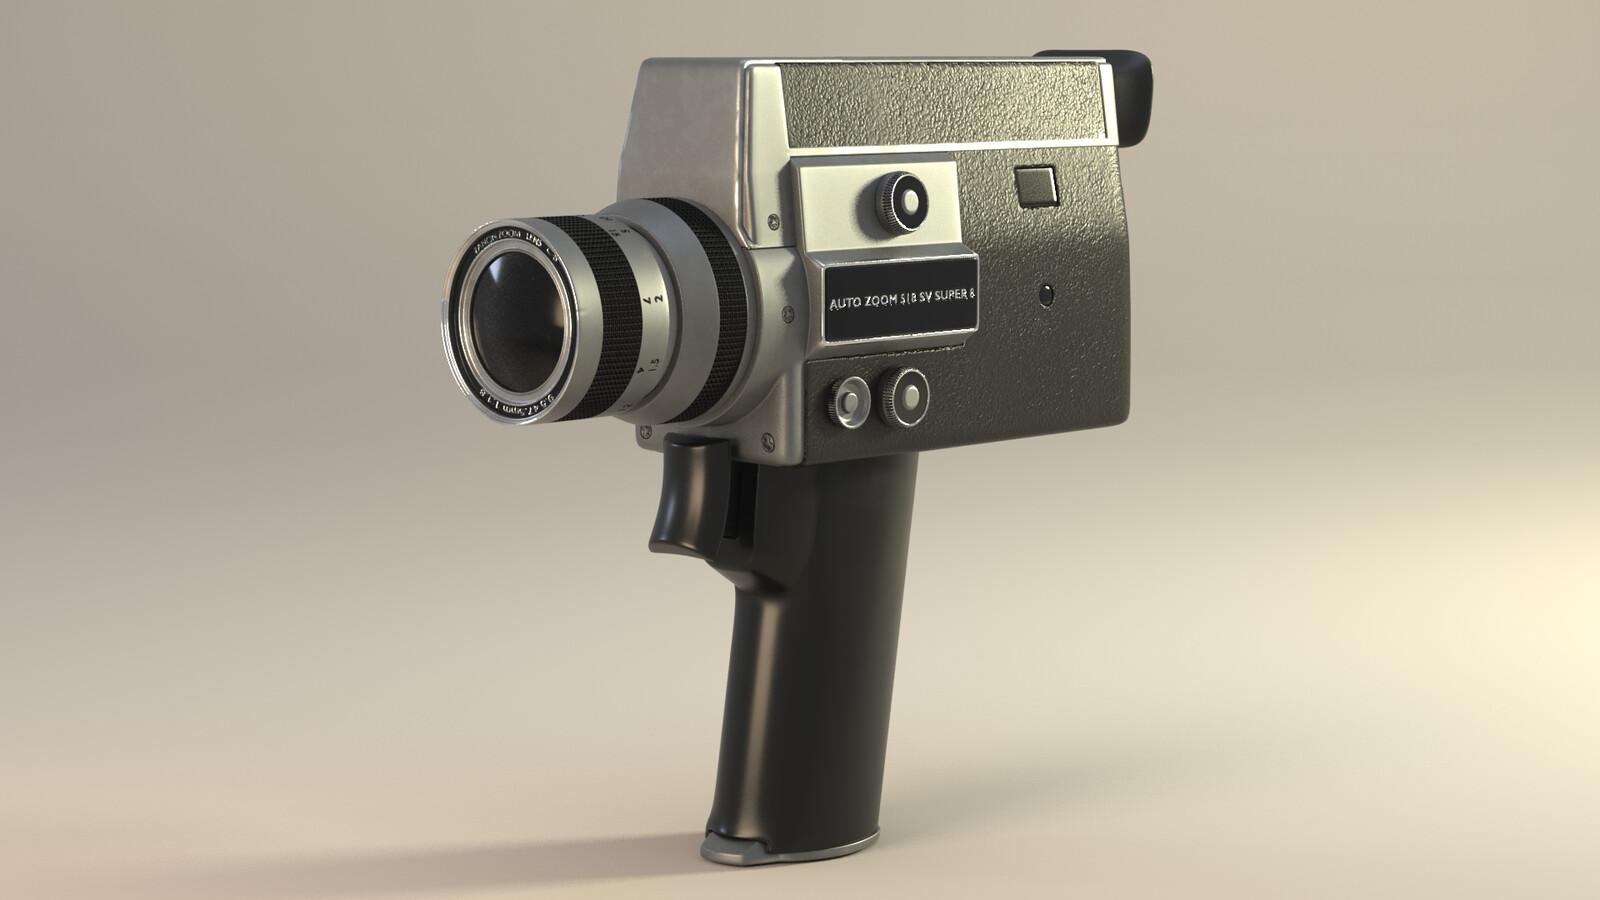 1970's Super 8 Film Camera